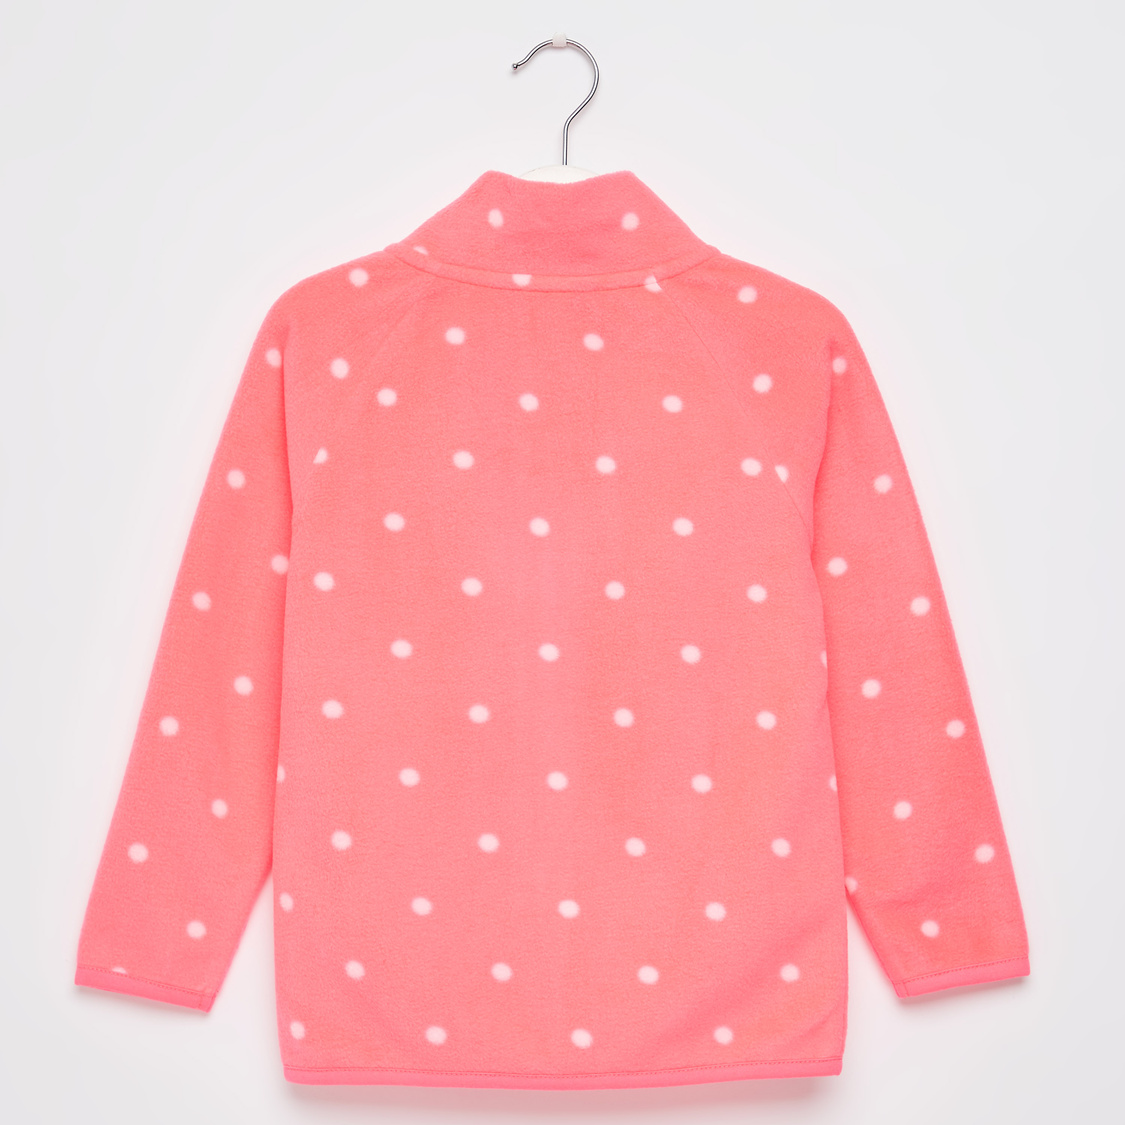 Polka Dots Print Jacket with High Neck and Long Sleeves